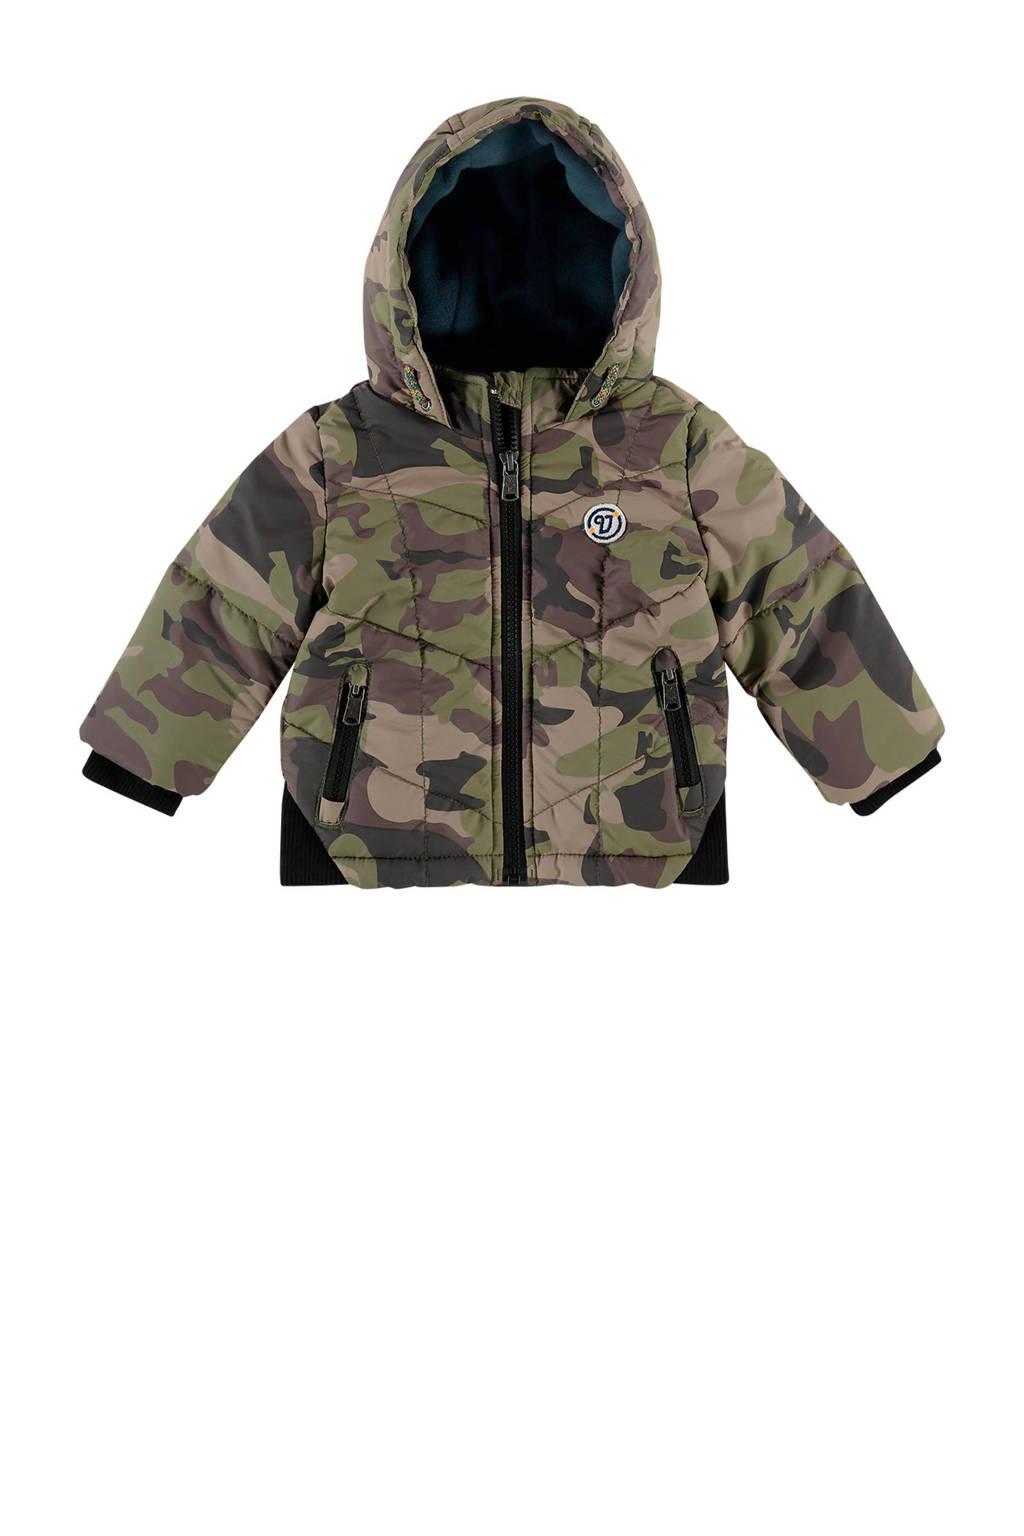 Vingino winterjas Taka camouflage army, Army camouflage